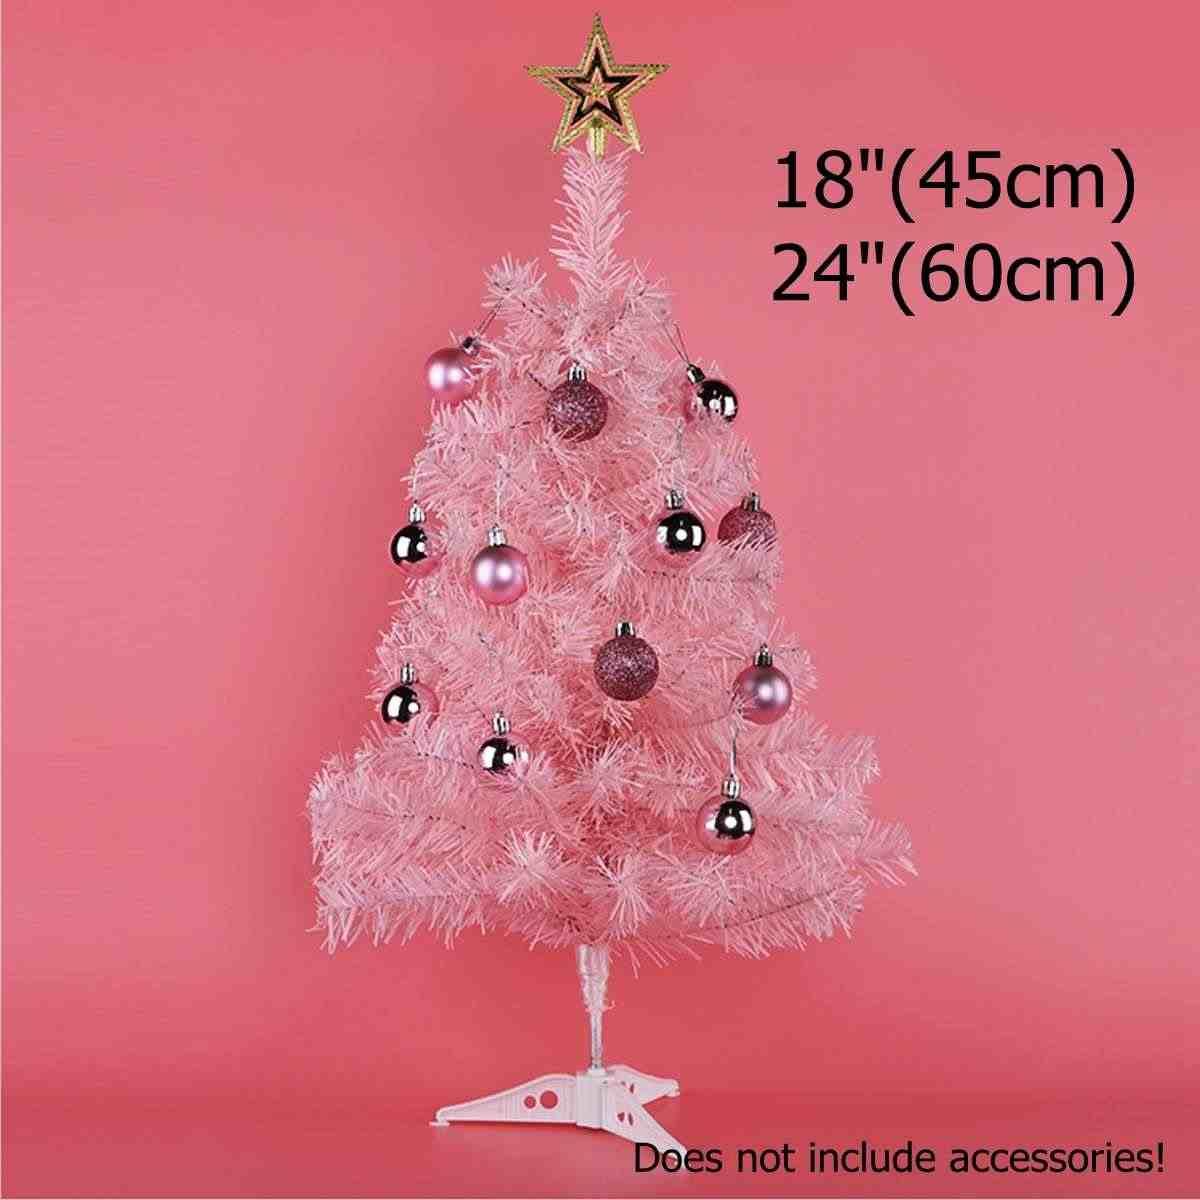 1.5/2ft 45/60cm ורוד מלאכותי חג המולד עץ X mas PVC עץ ירוק עם Stand החגים מקורה חיצוני רומנטי Decoratio